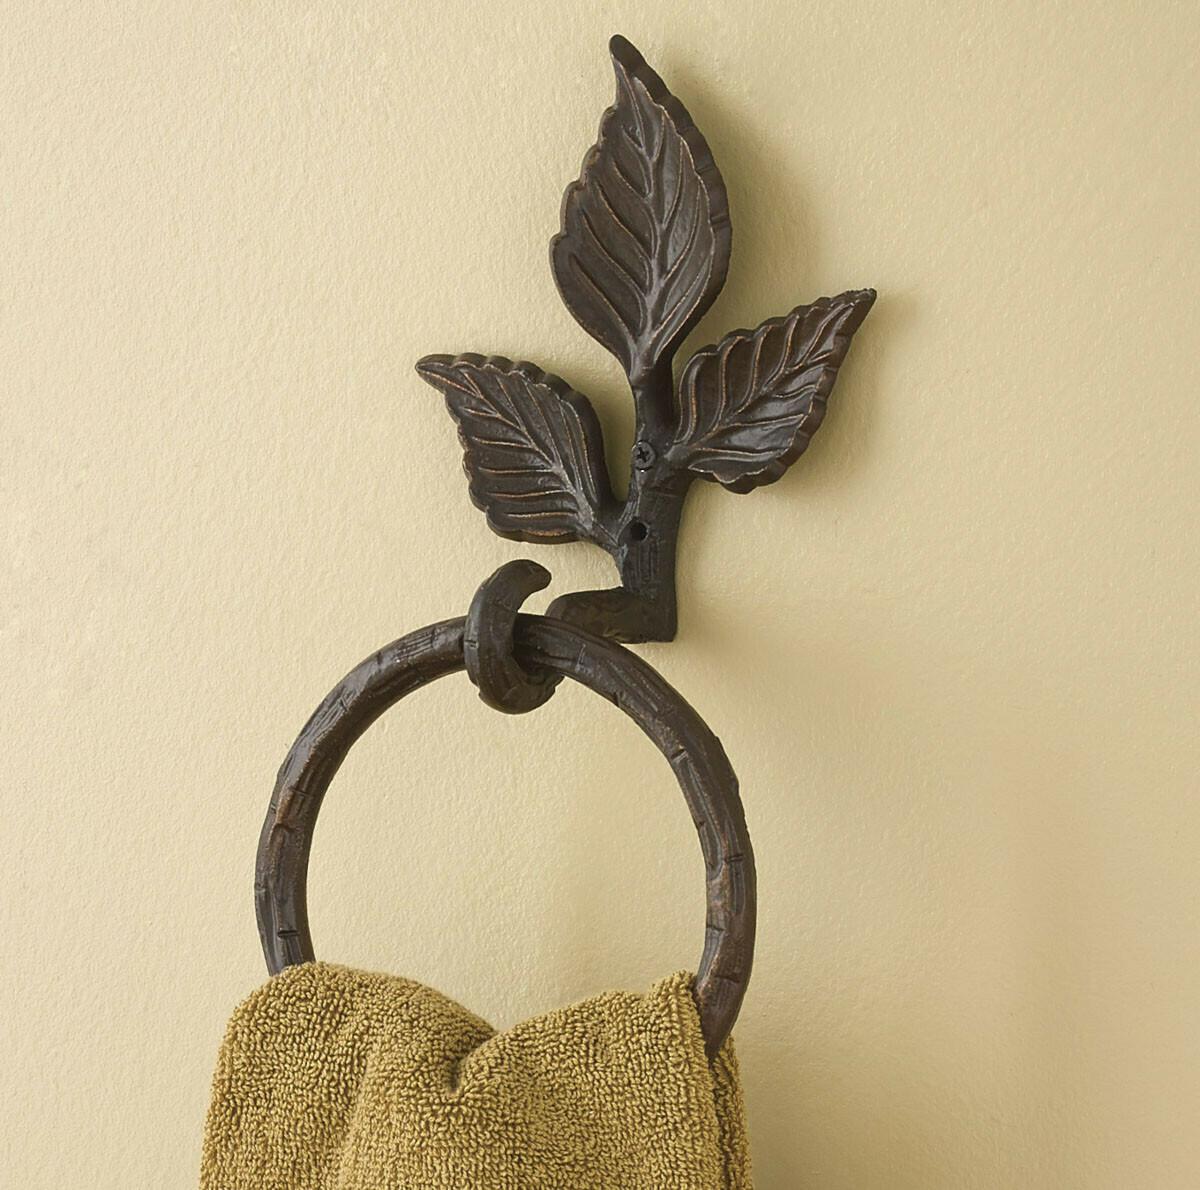 Birchwood Ring Hook